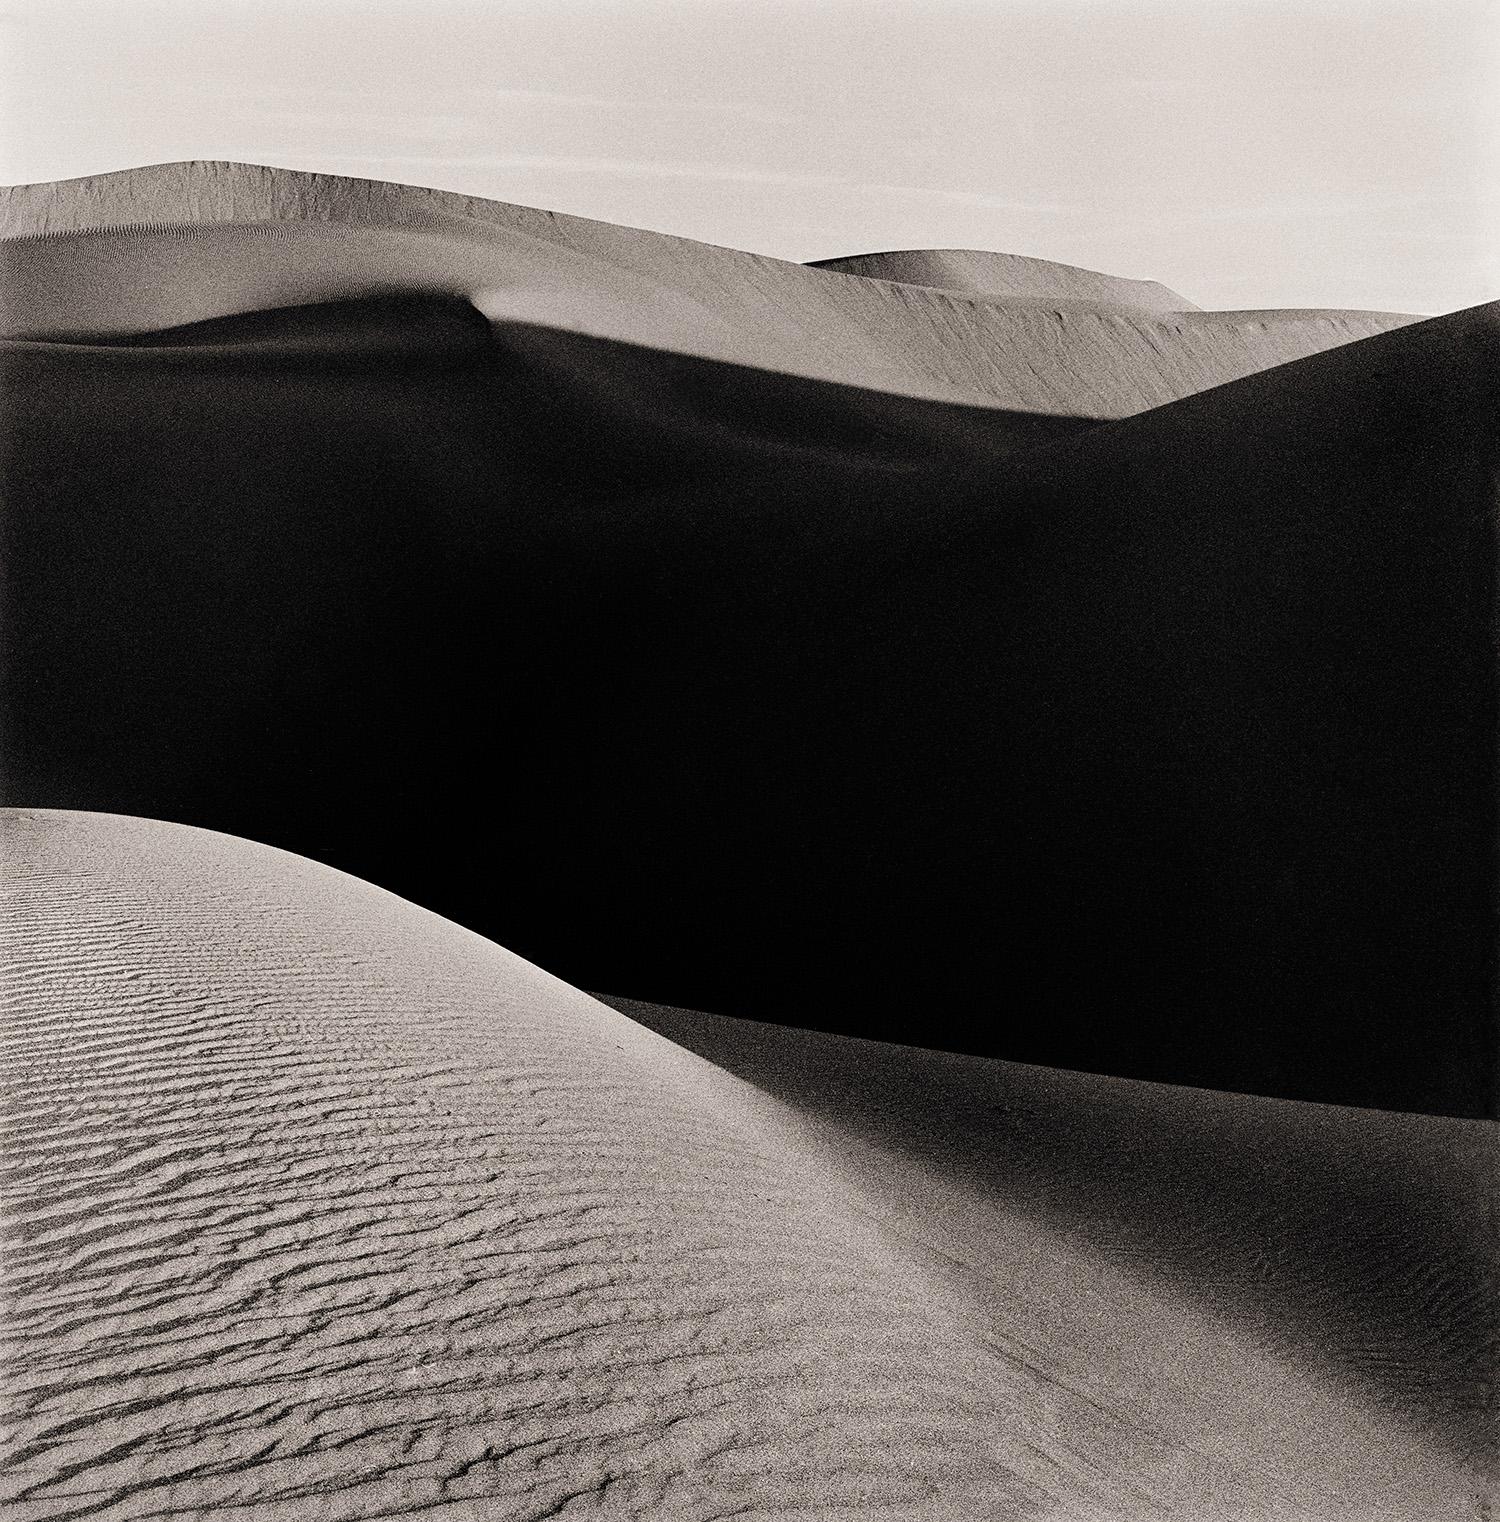 Algodones Dunes, California, 2001